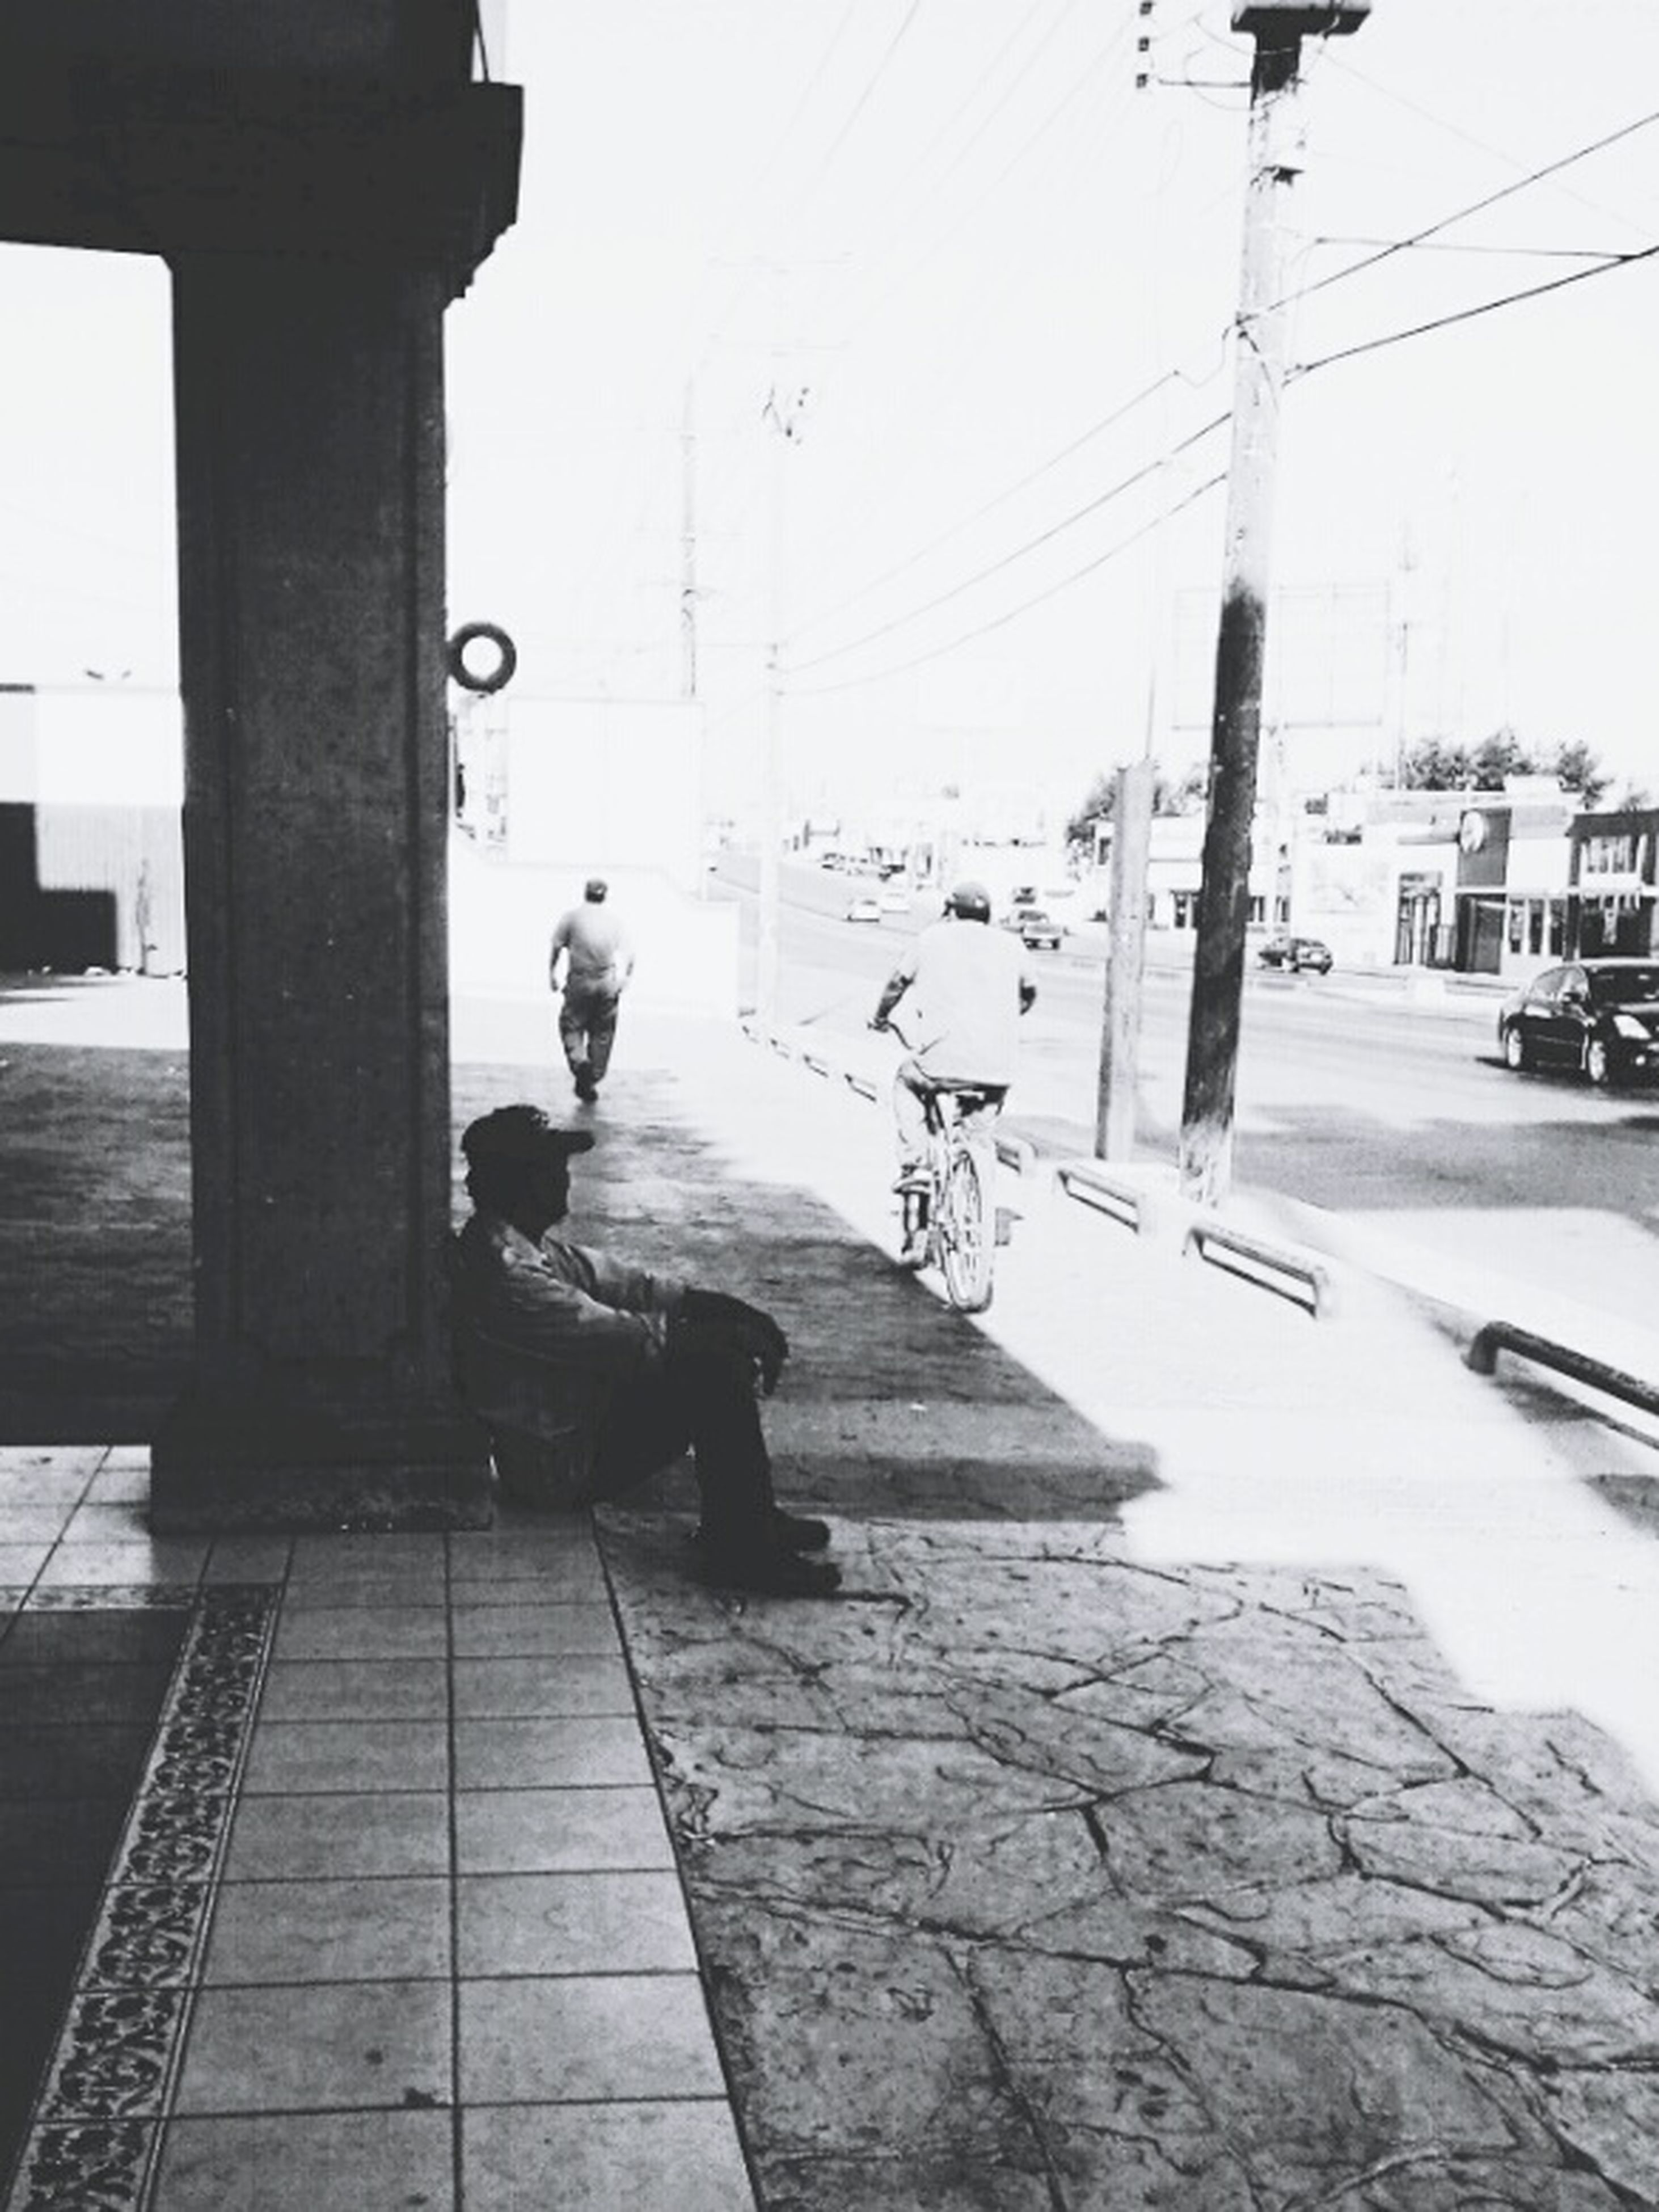 building exterior, street, built structure, architecture, city, full length, walking, one animal, animal themes, rear view, transportation, city life, men, road, sidewalk, street light, dog, power line